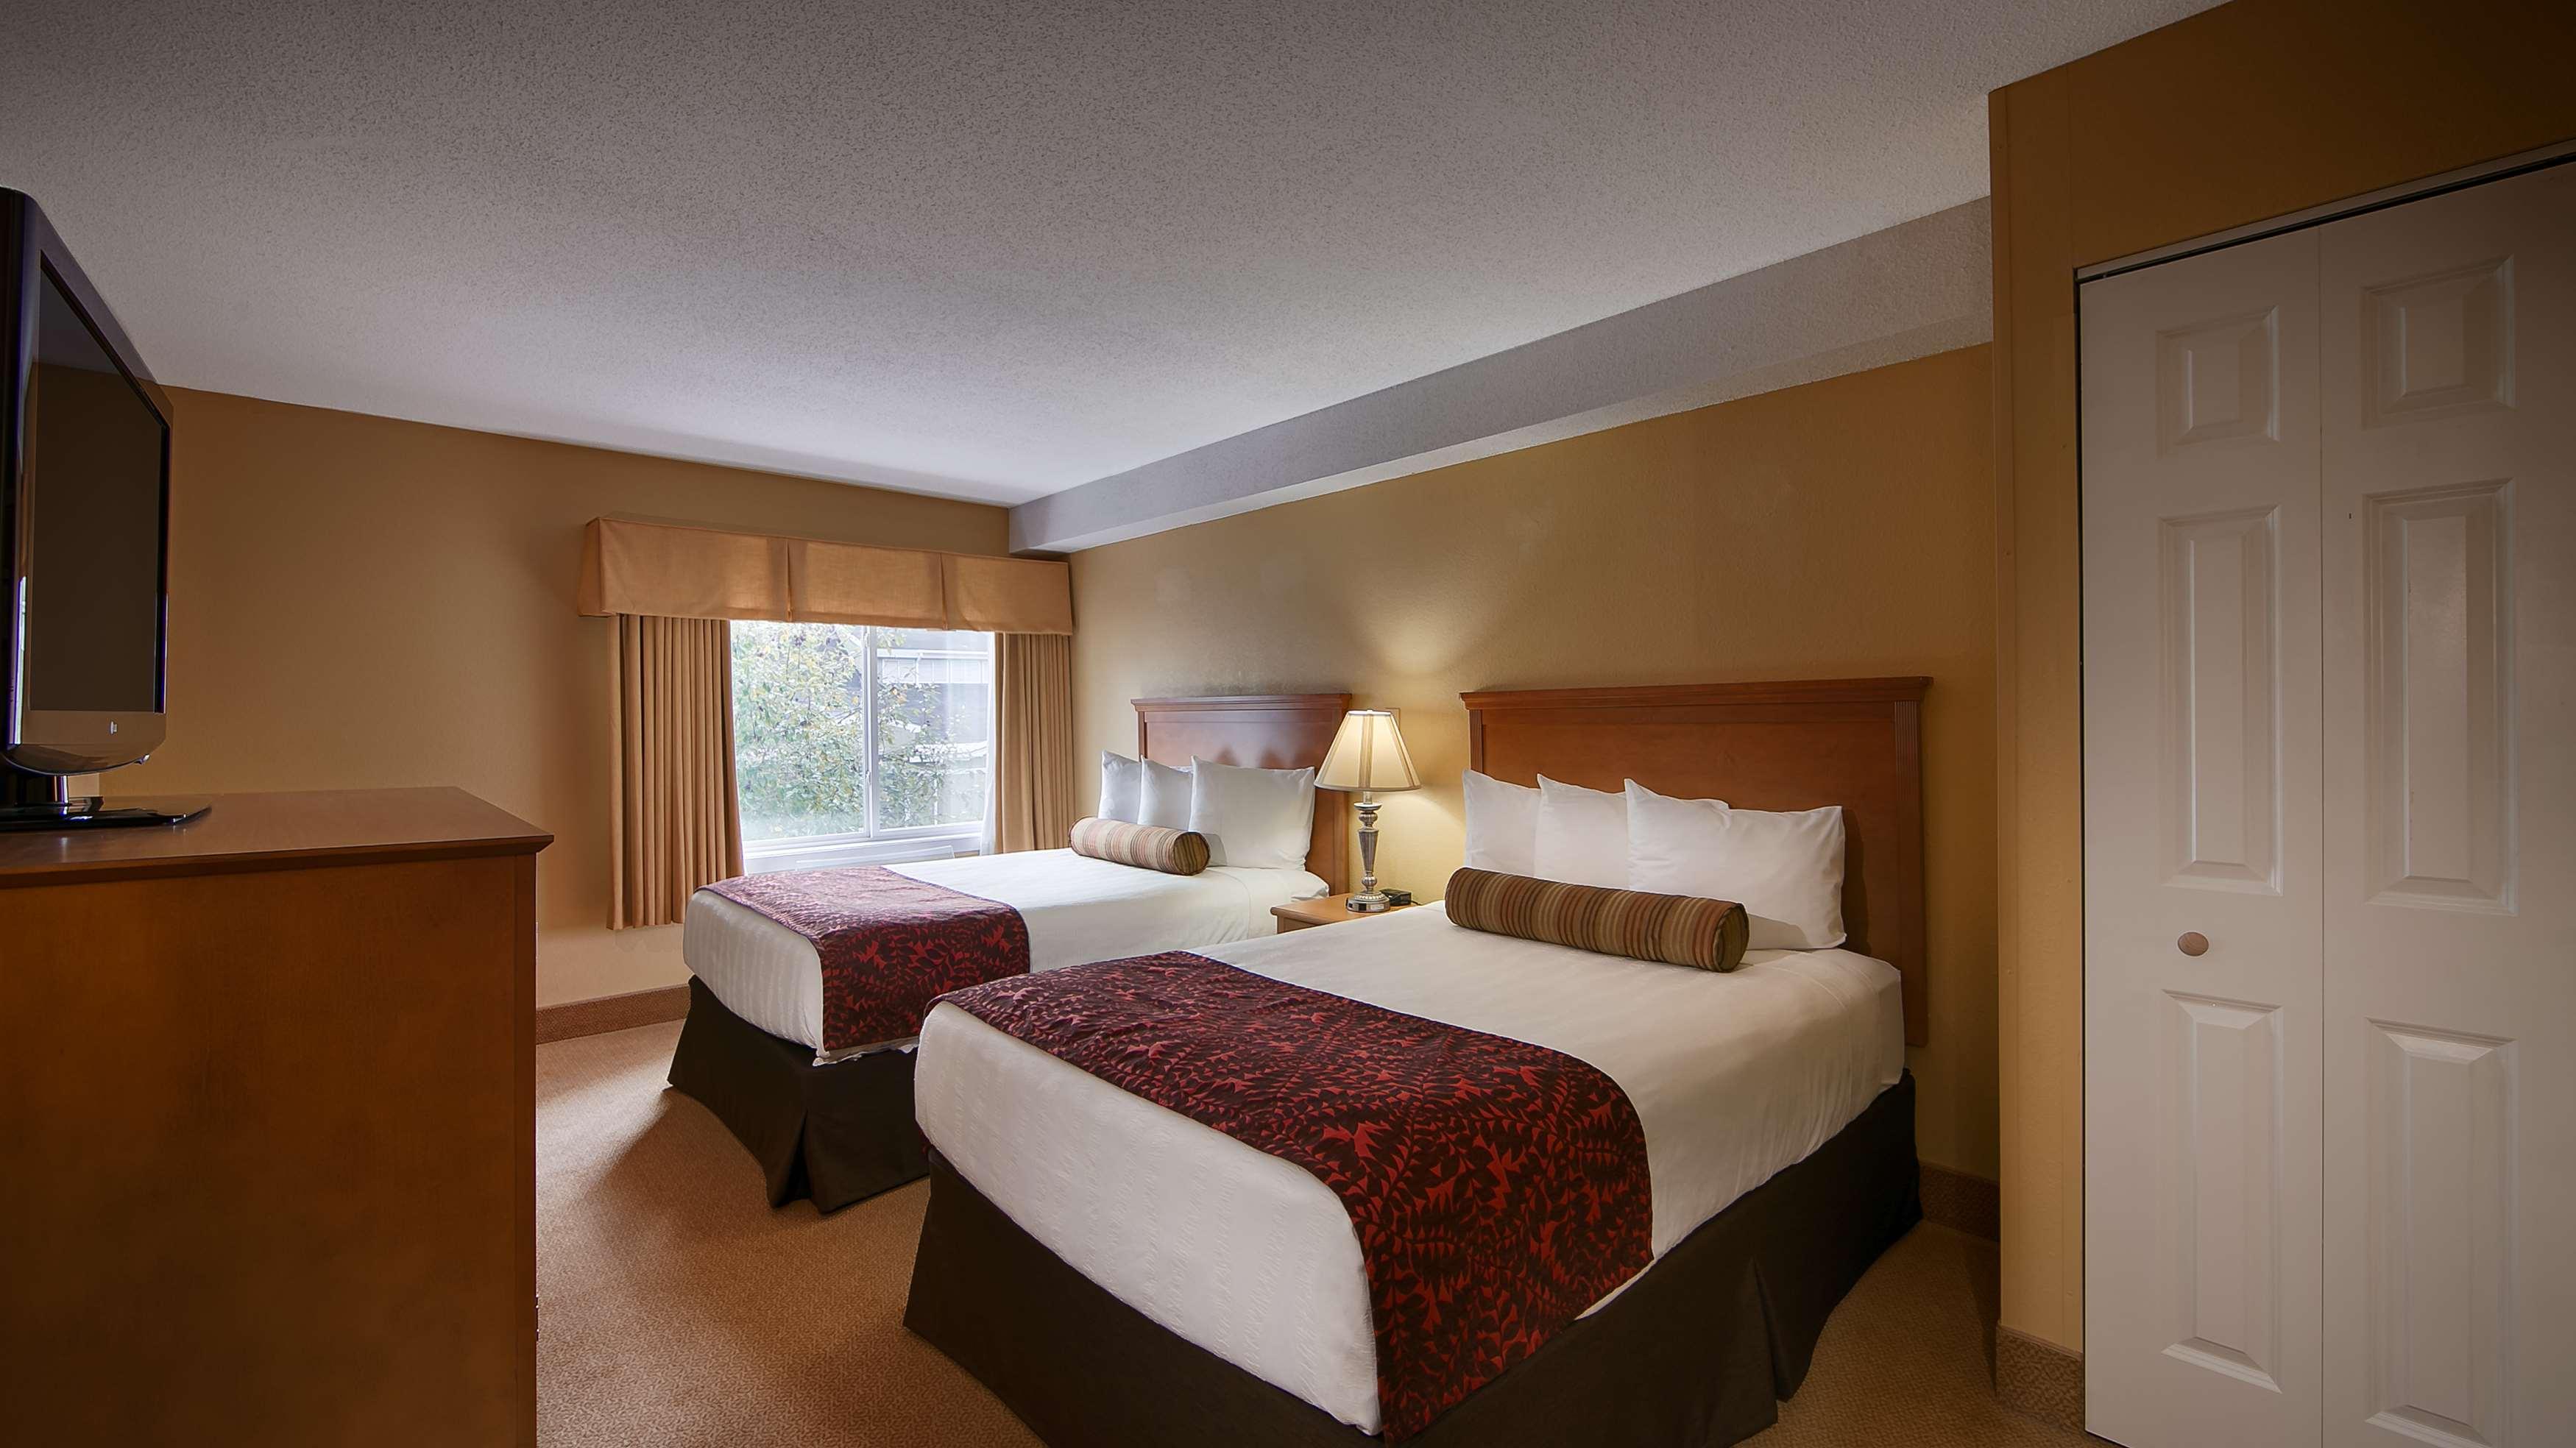 Best Western Plus Windjammer Inn & Conference Center image 29